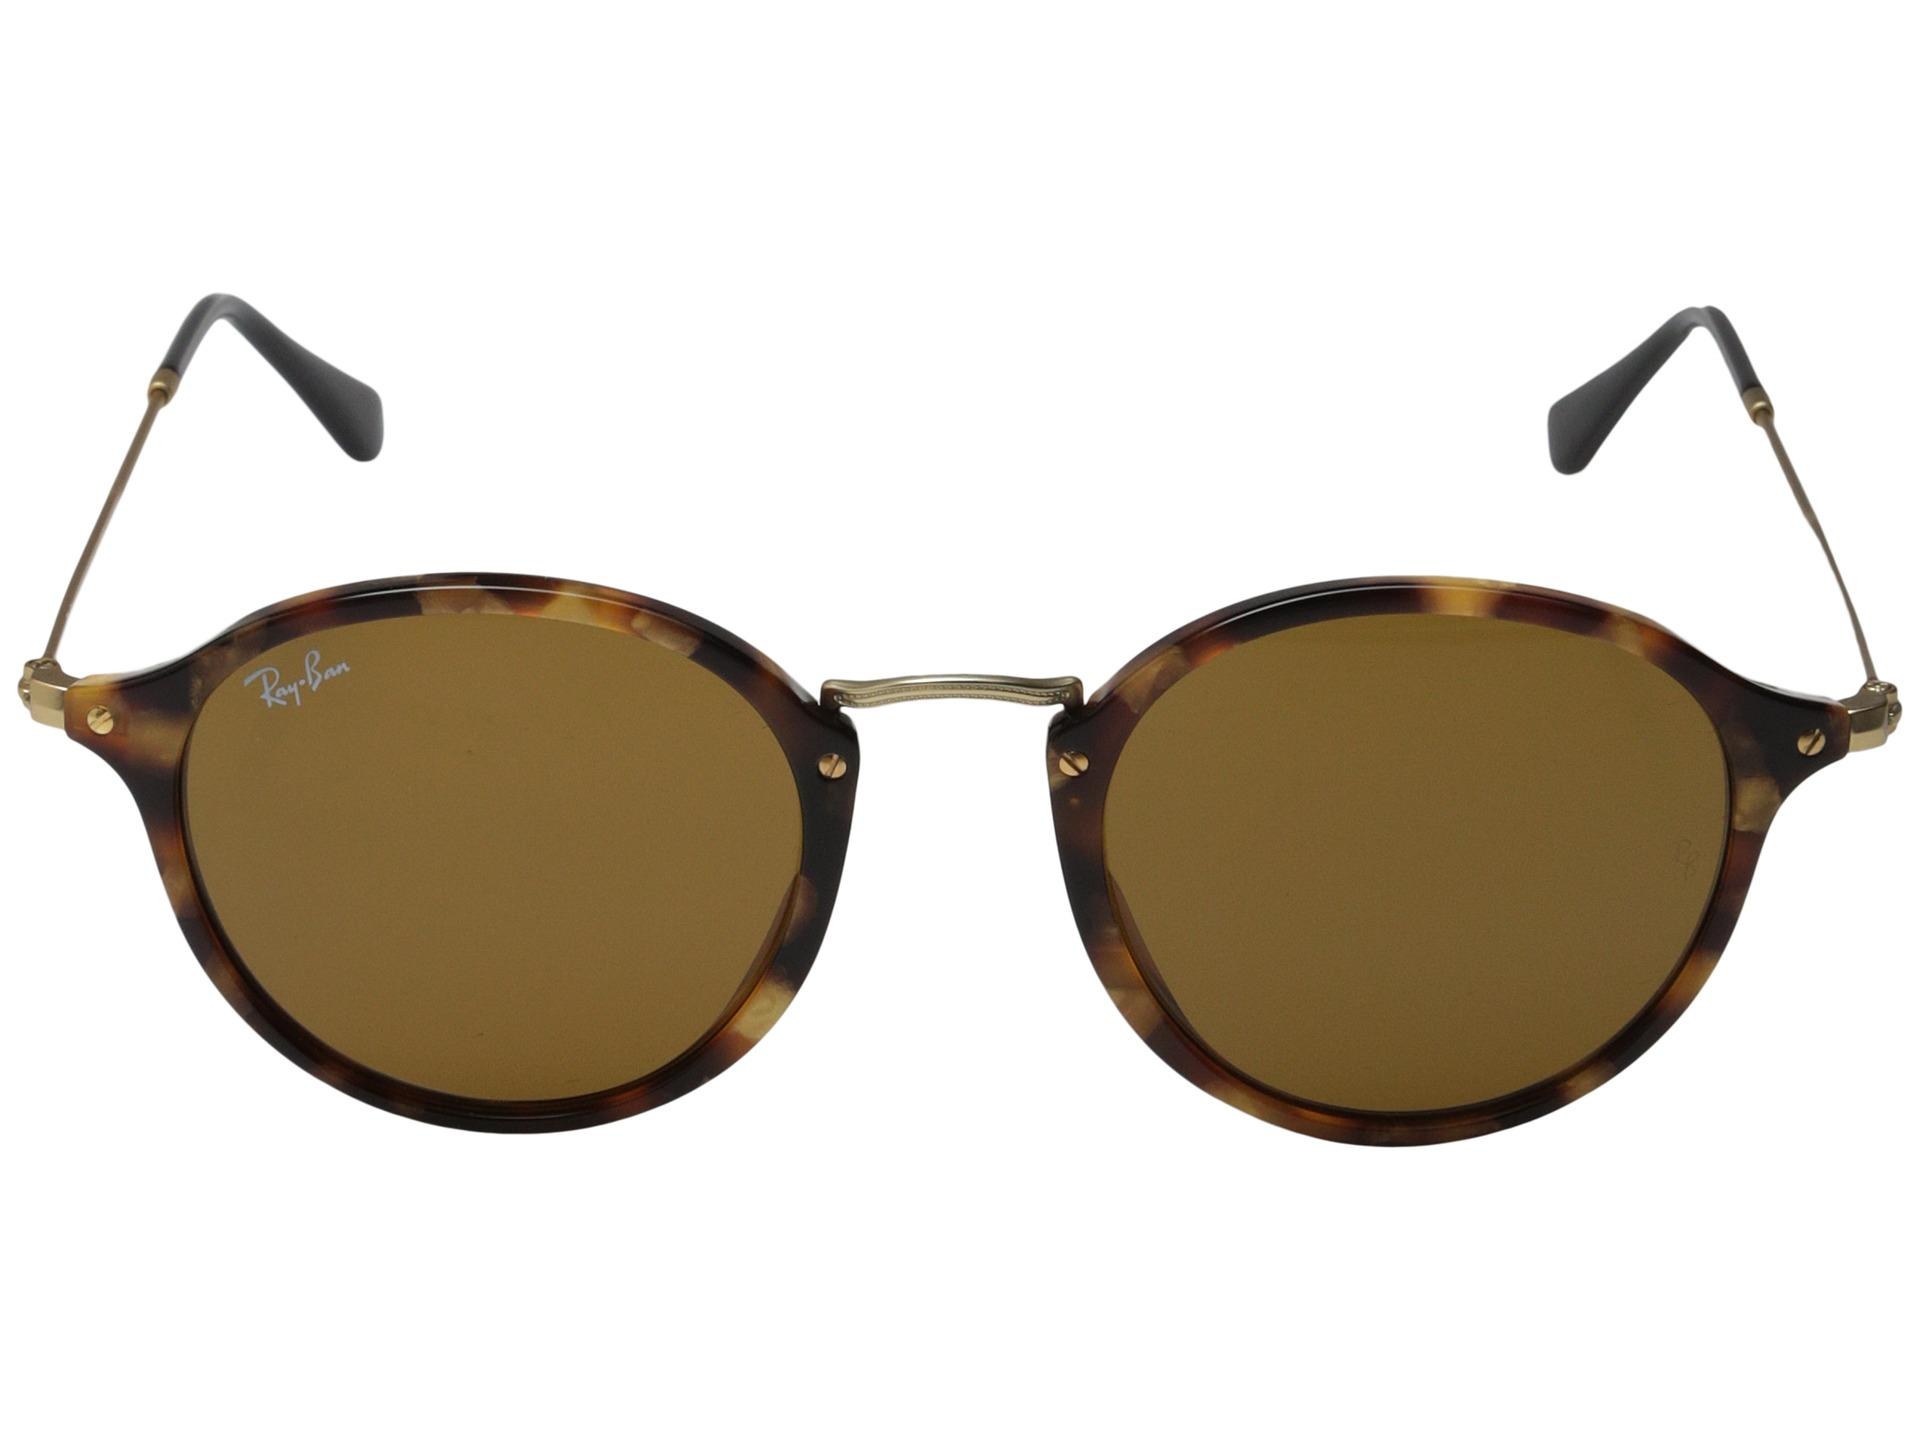 buy ban eyeglasses india